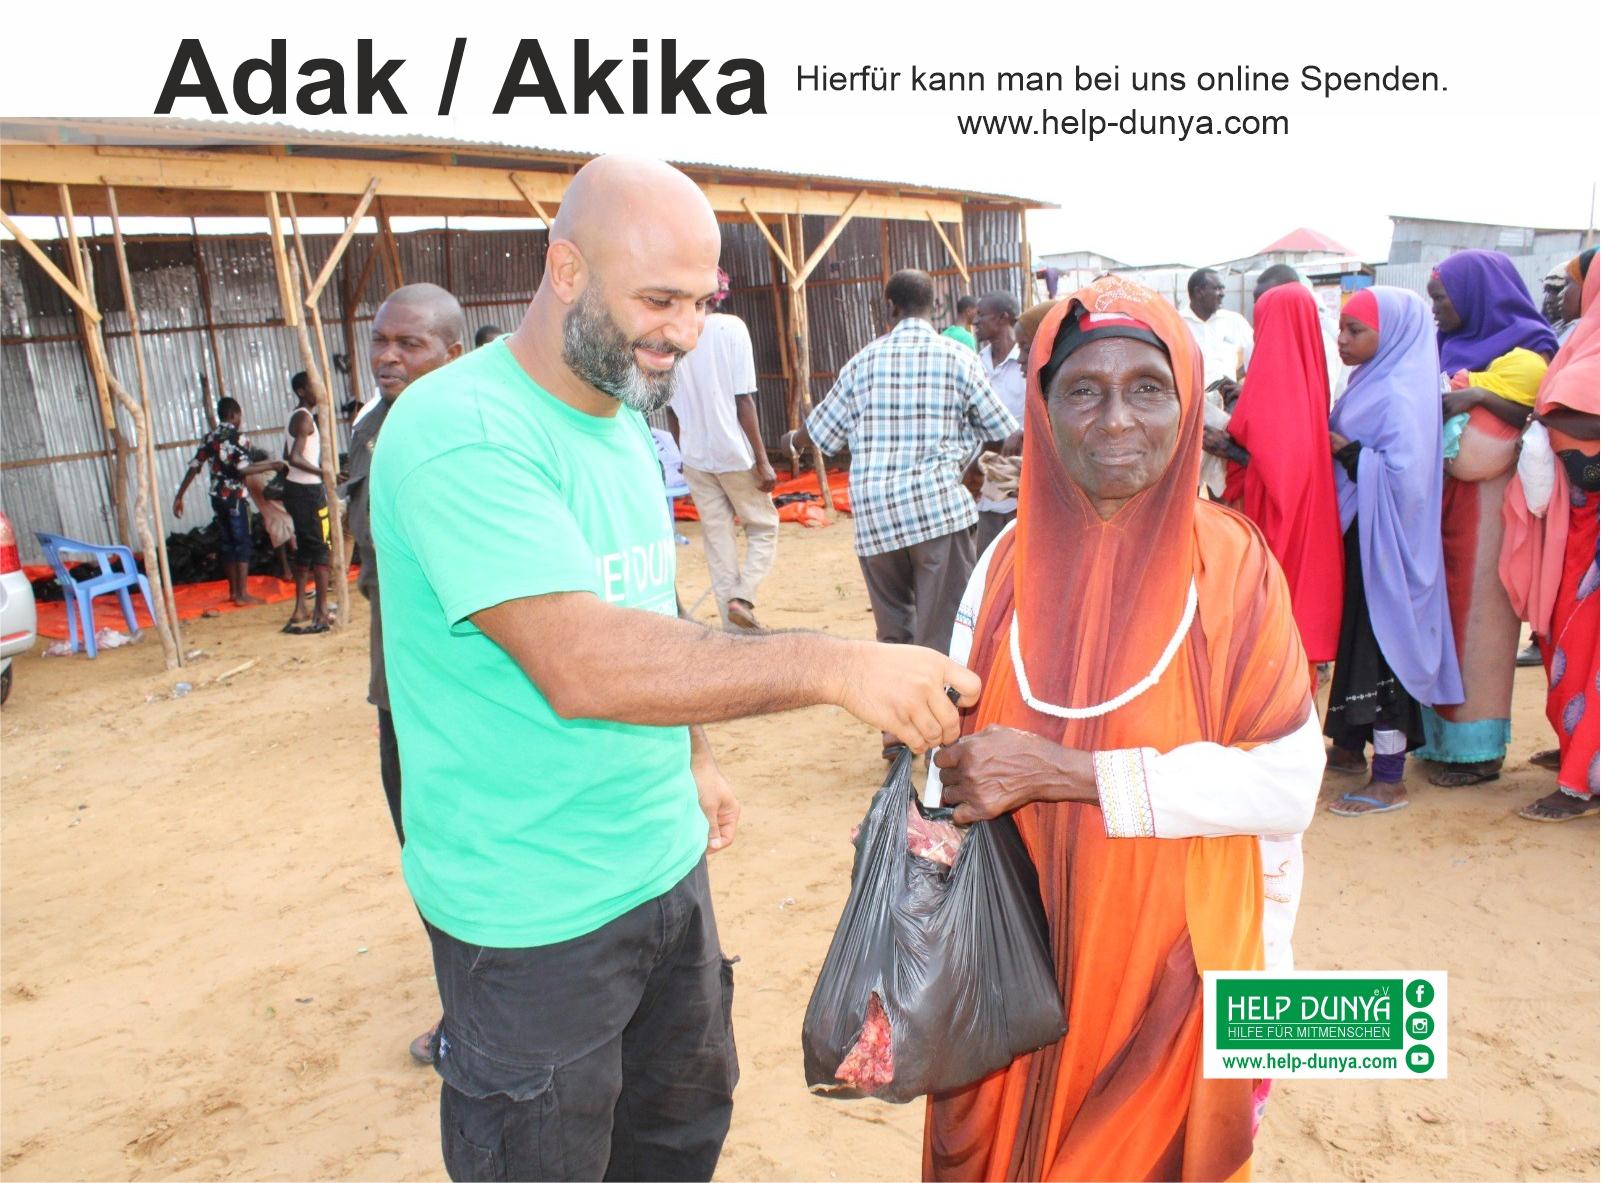 Help Dunya Adak Akika